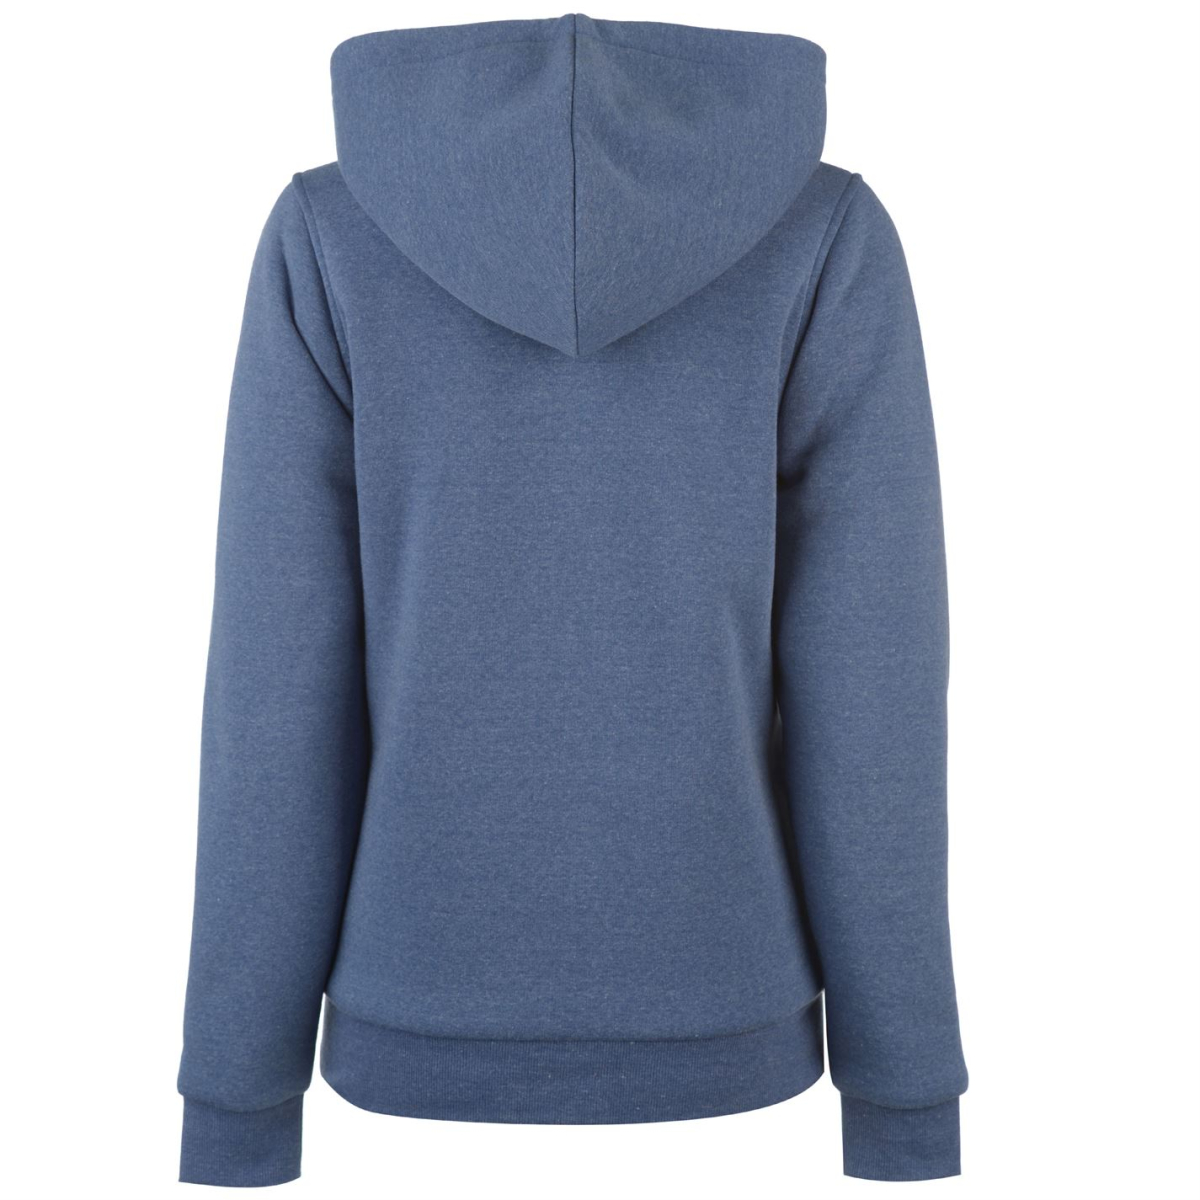 Lee Cooper Kapuzenjacke Jacke Damen Sweatshirt Kapuzenpullover Pullover 5321